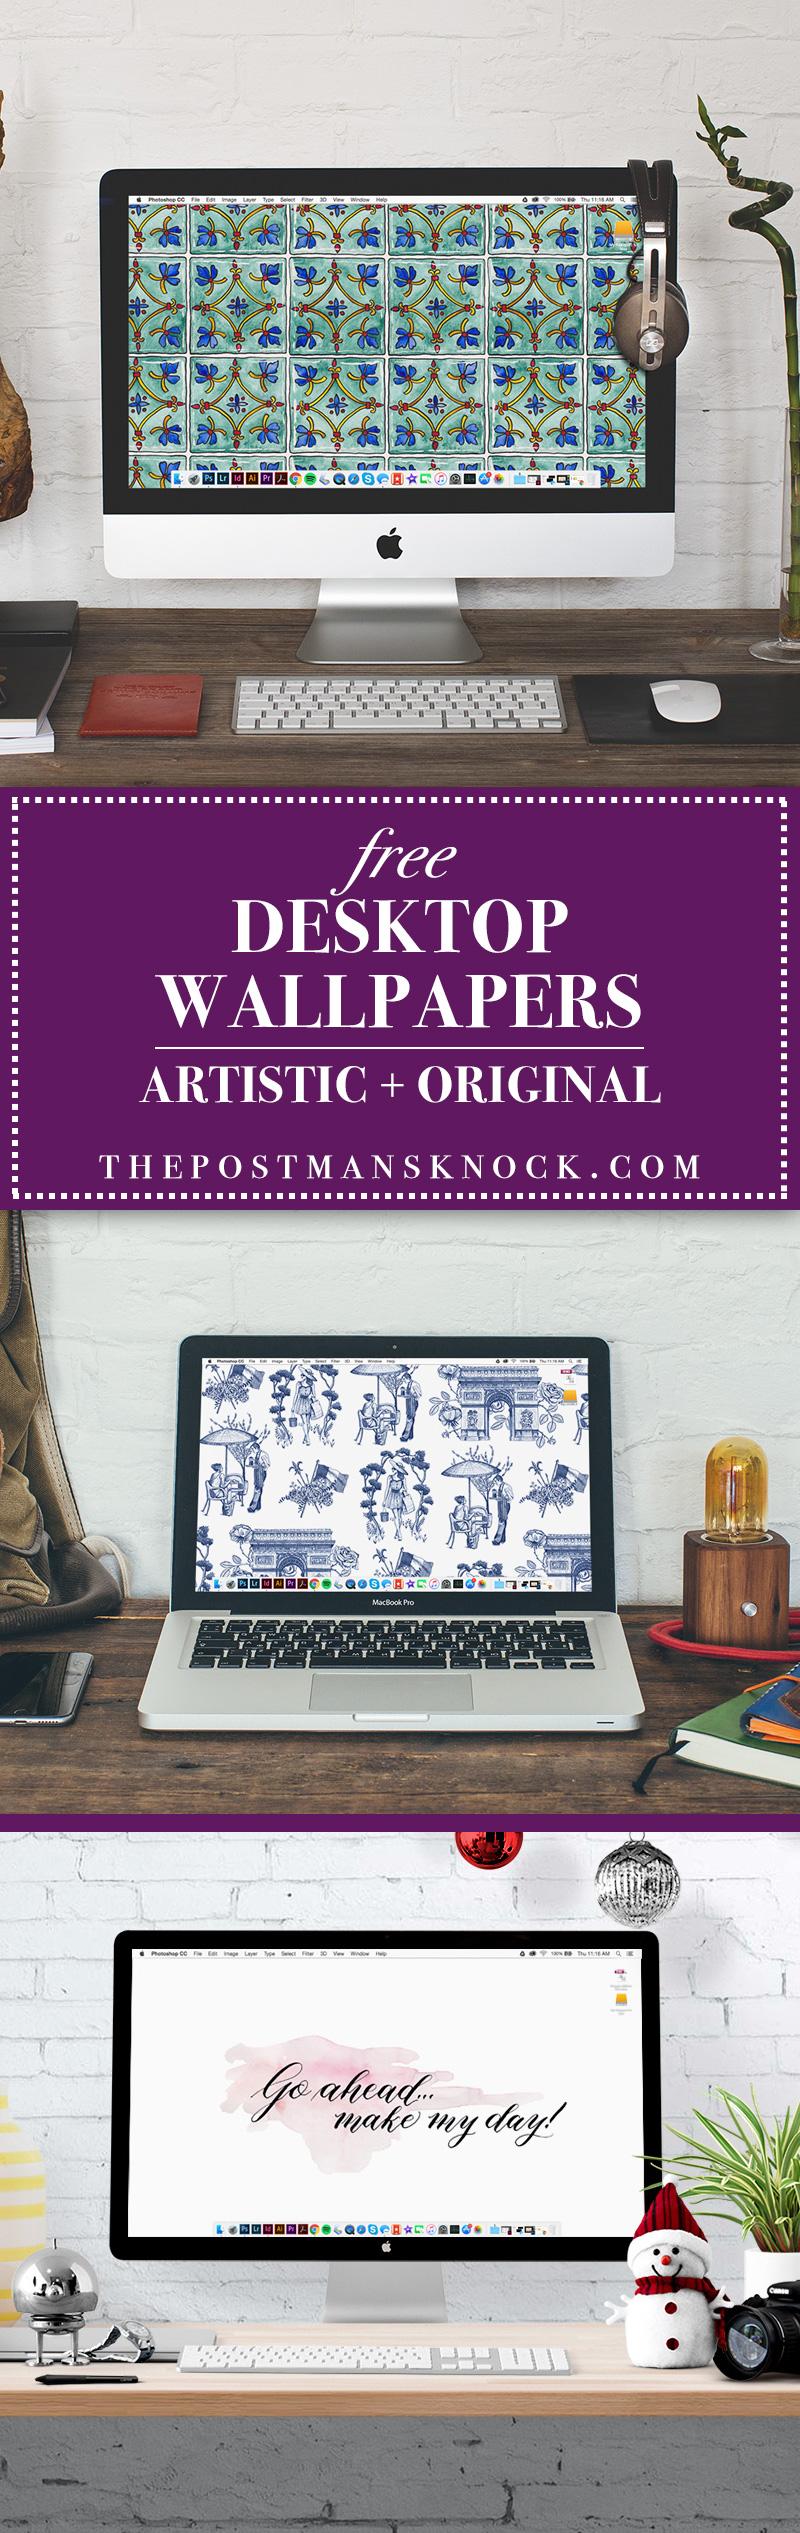 Three Free Desktop Wallpapers | The Postman's Knock